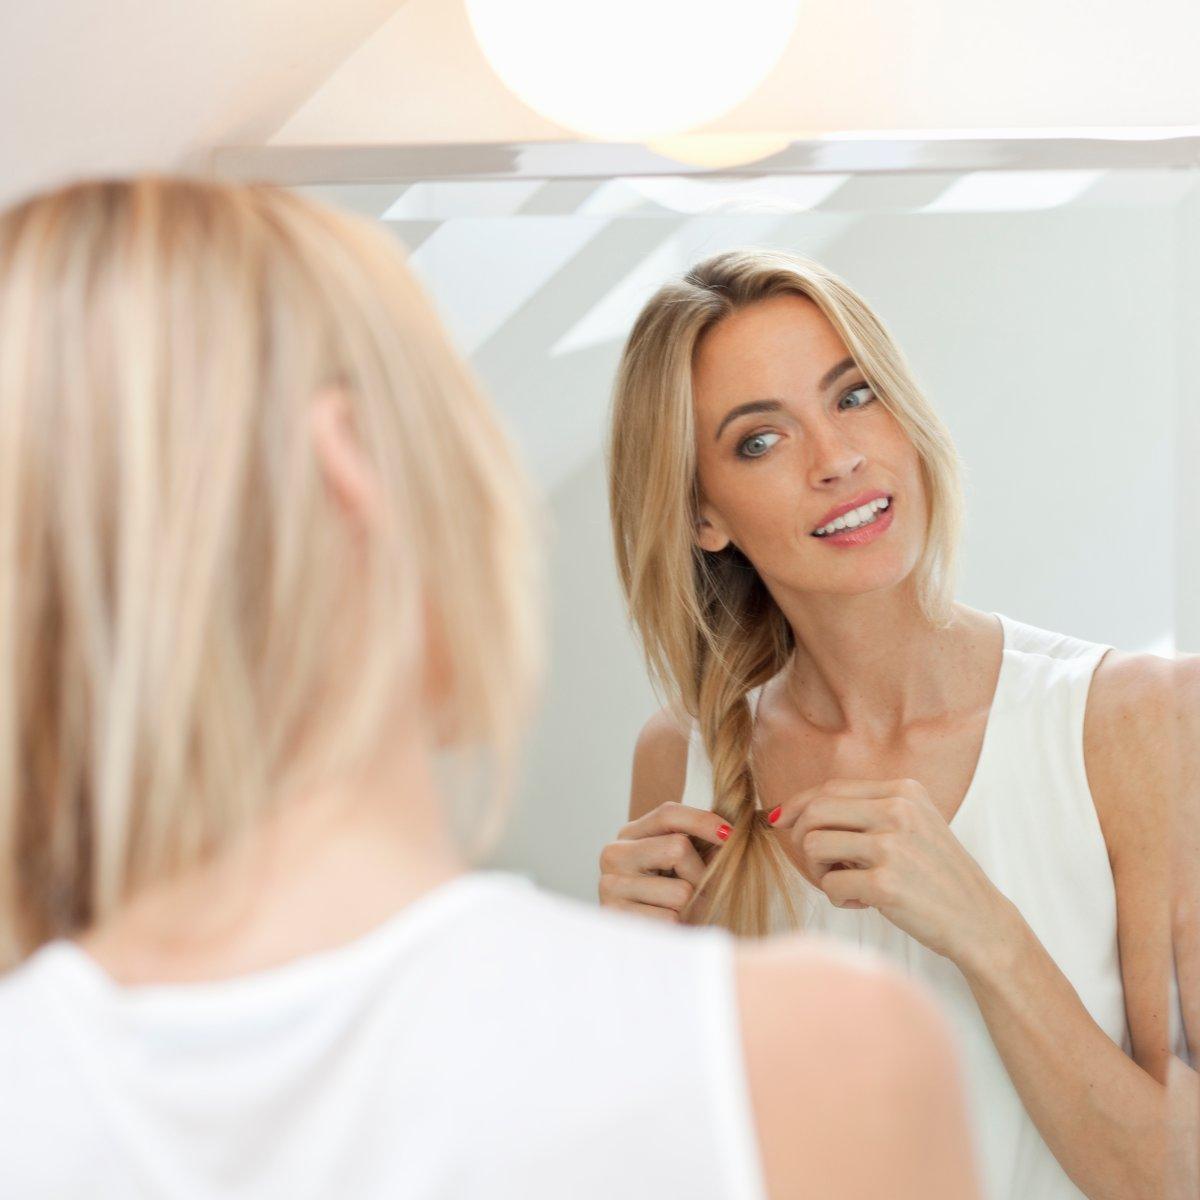 Diese Frisuren helfen bei fettigen Haaren   bildderfrau.de